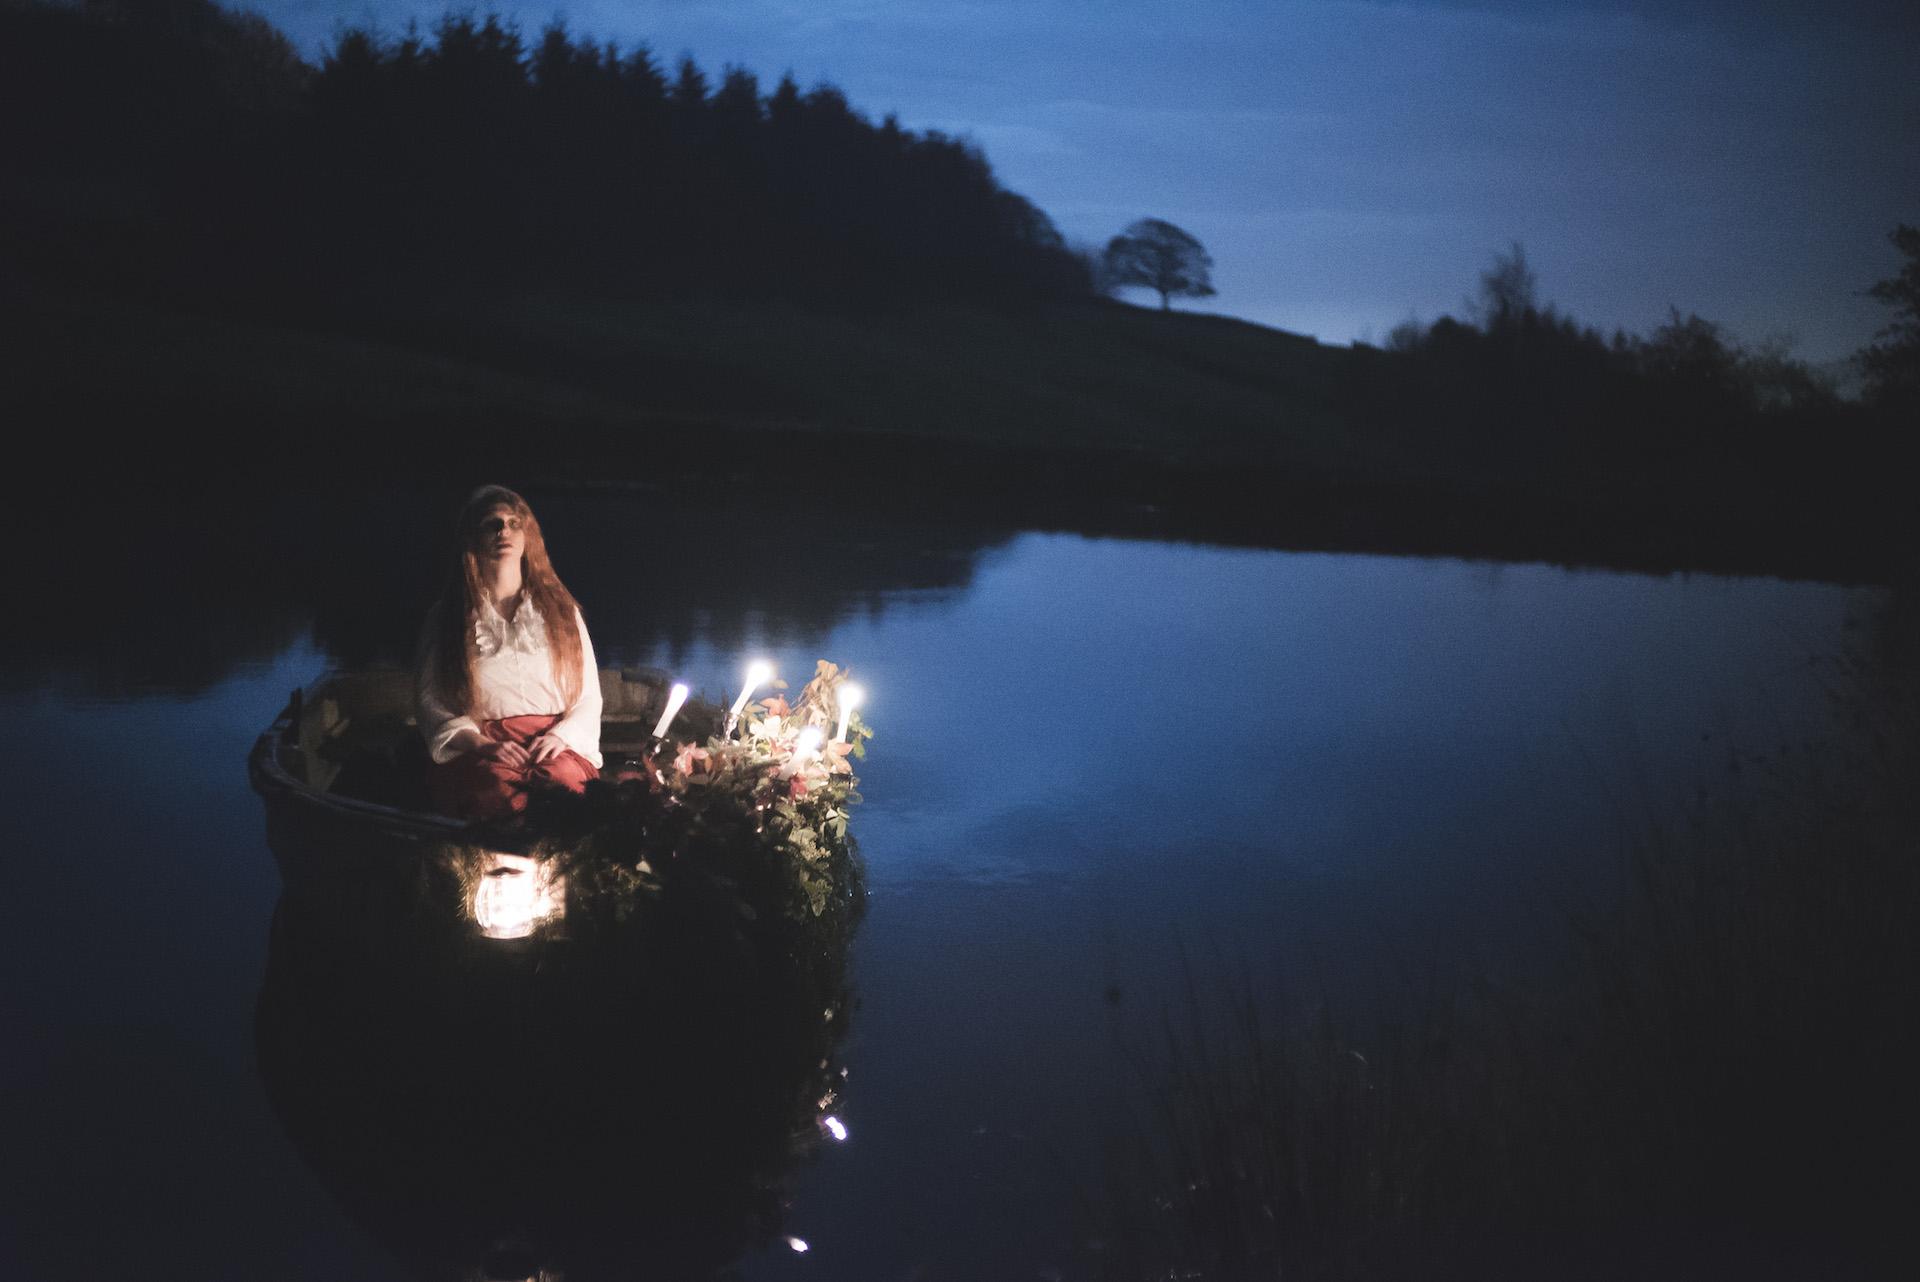 Lady of Shalott - Moonlight